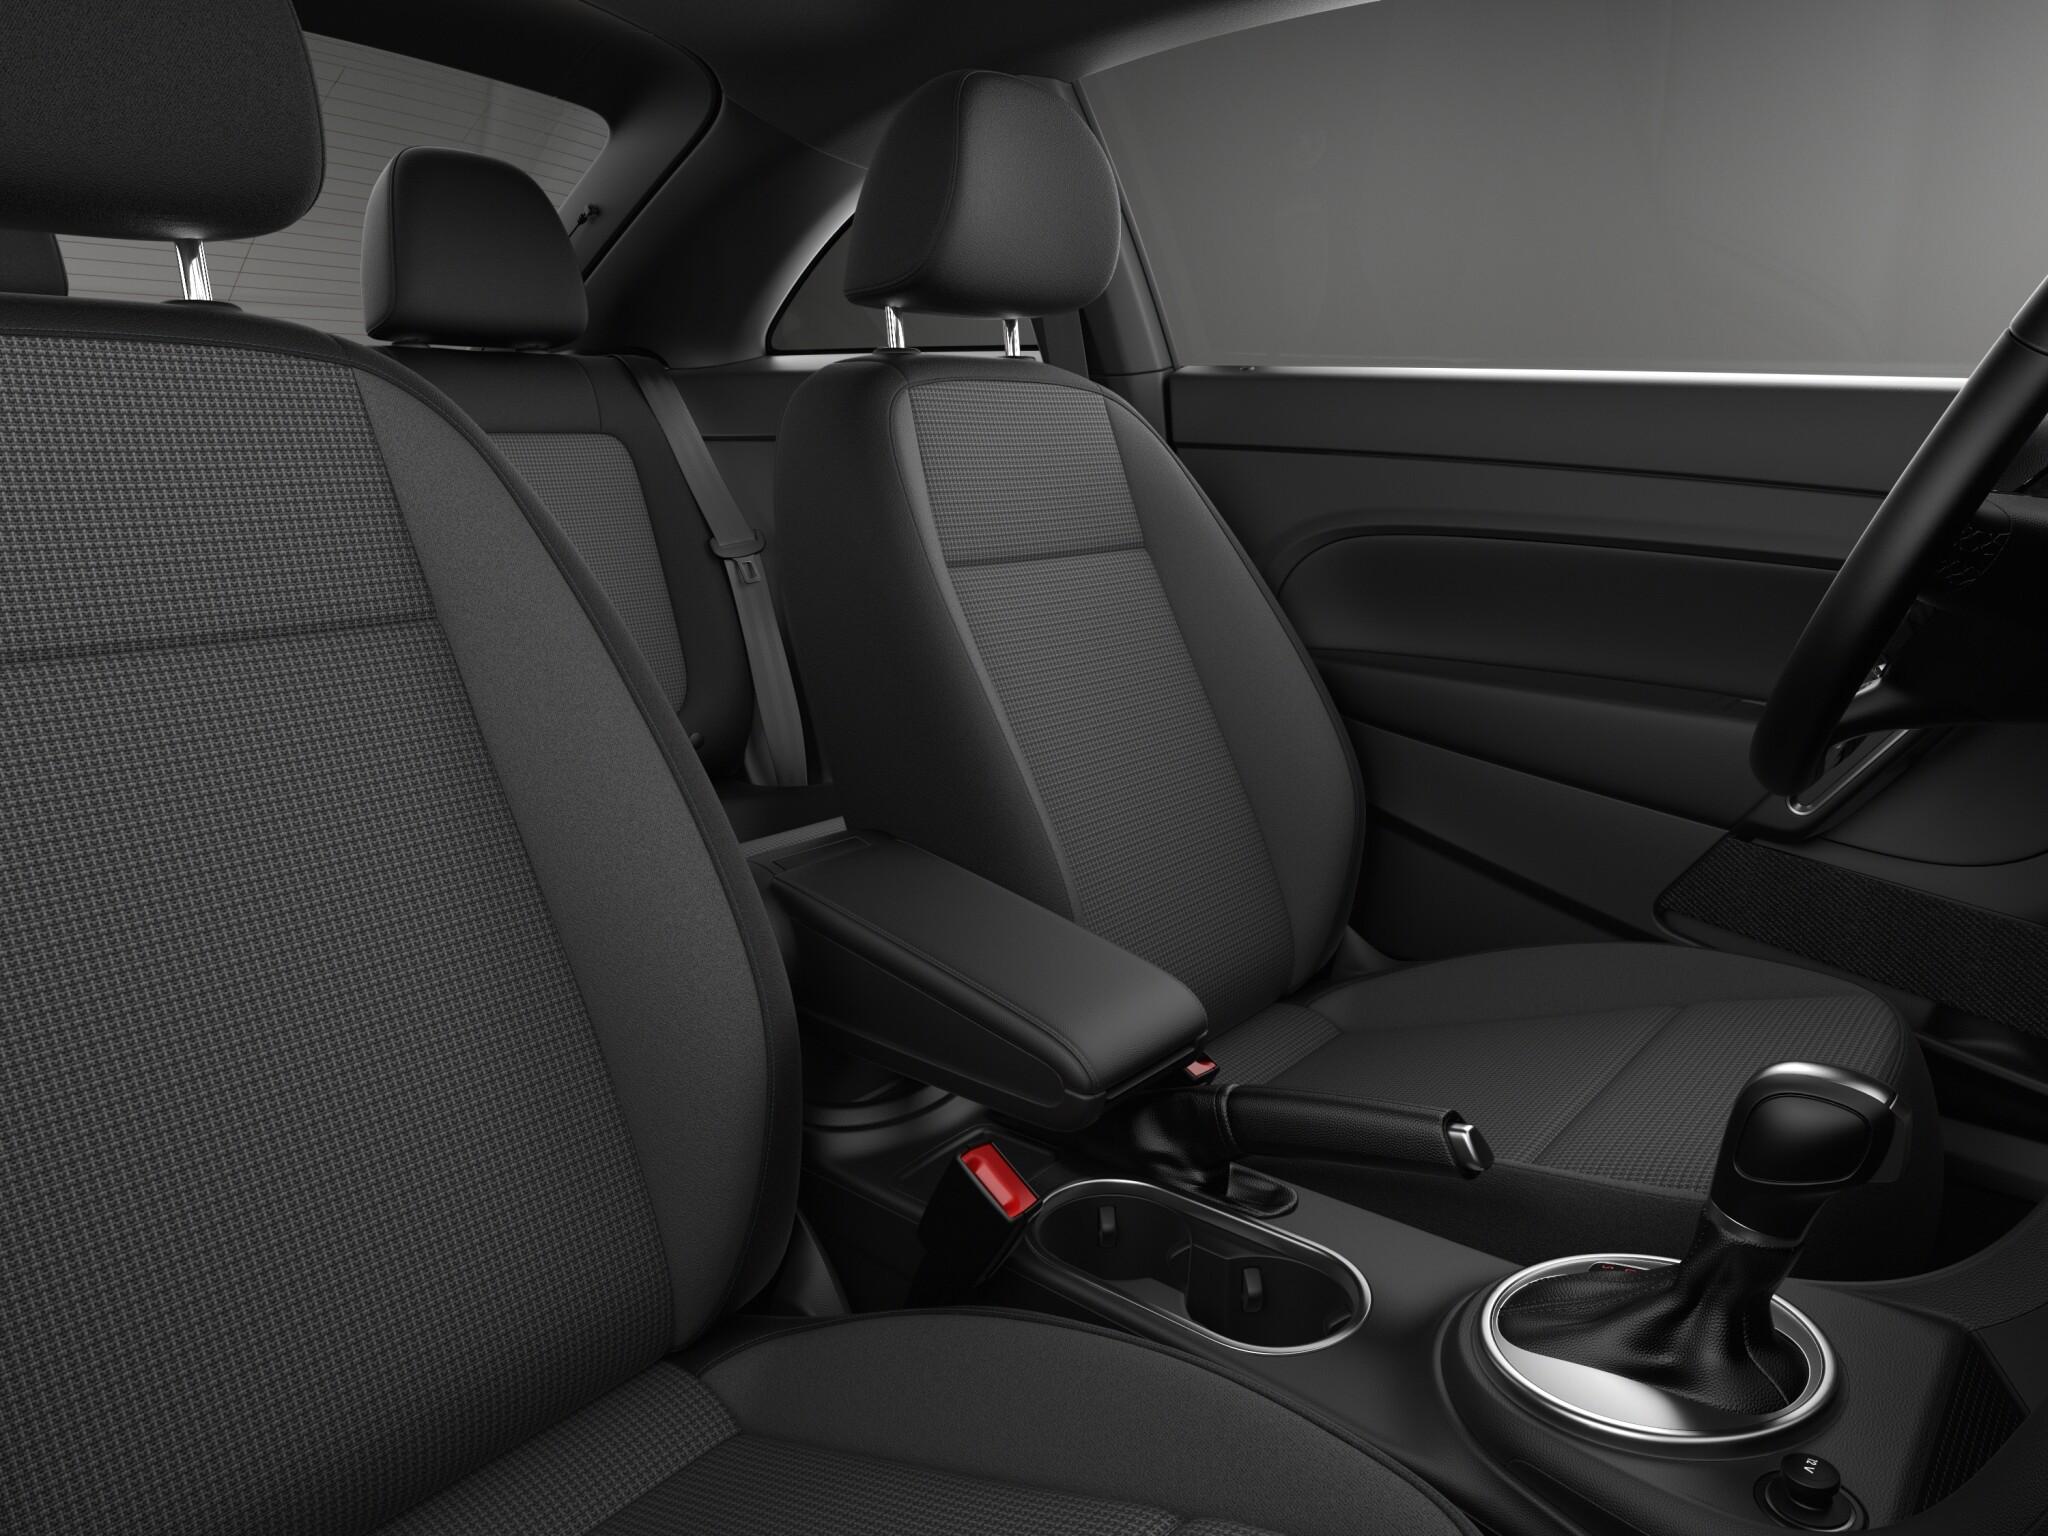 2019 Volkswagen Beetle S Front Interior Seating Picture